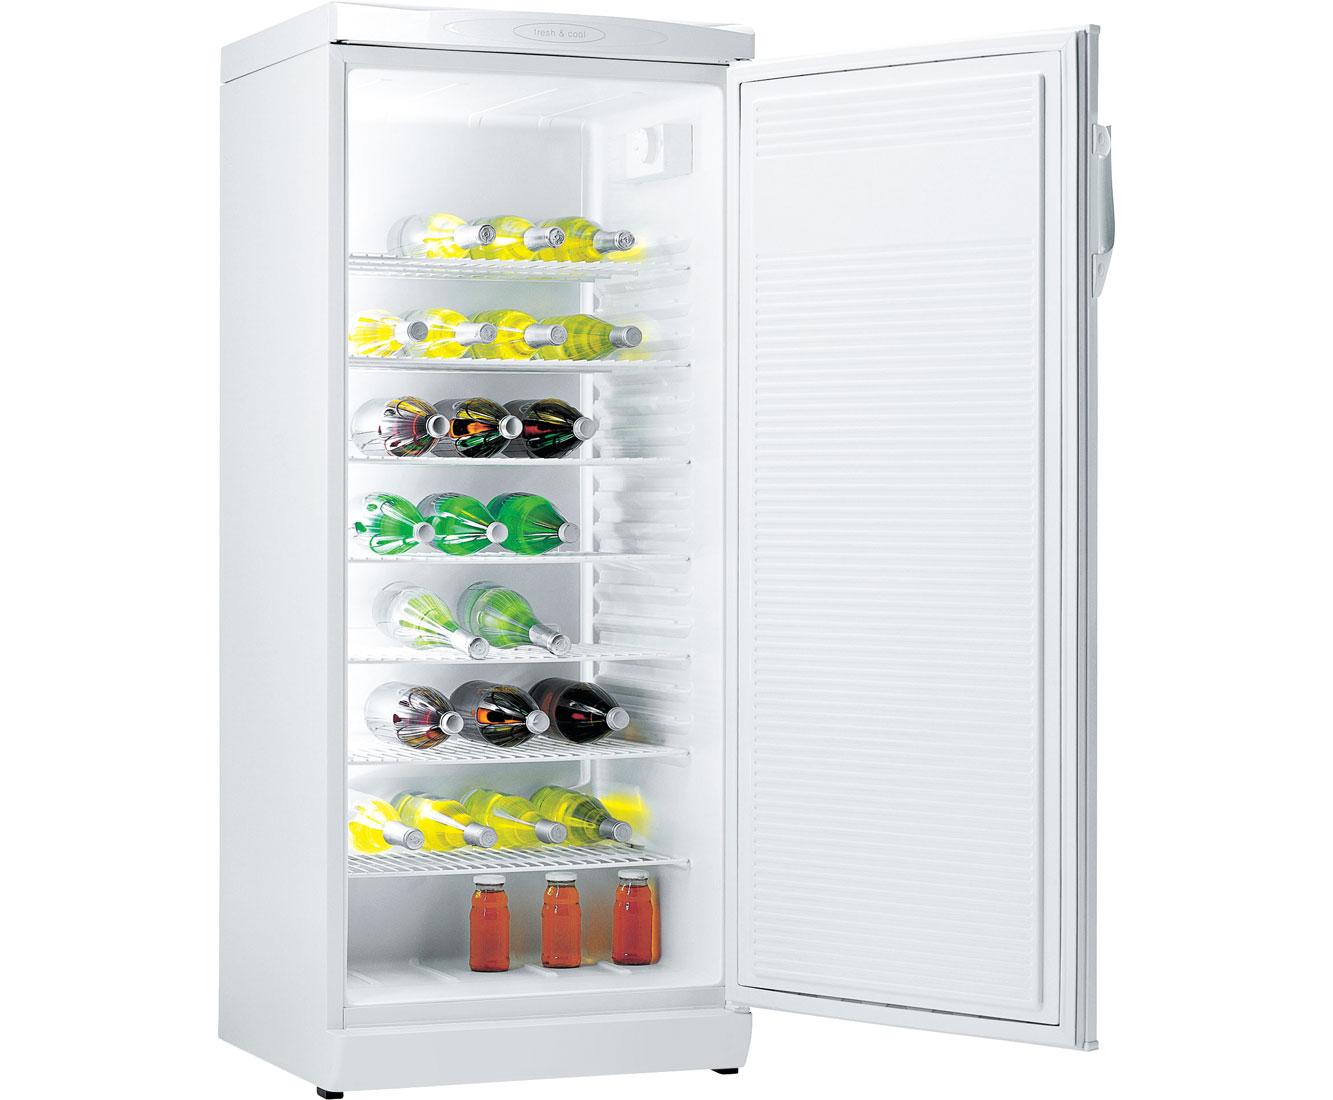 Gorenje Kühlschrank Weiß : Gorenje rvc w kühlschrank weiß a